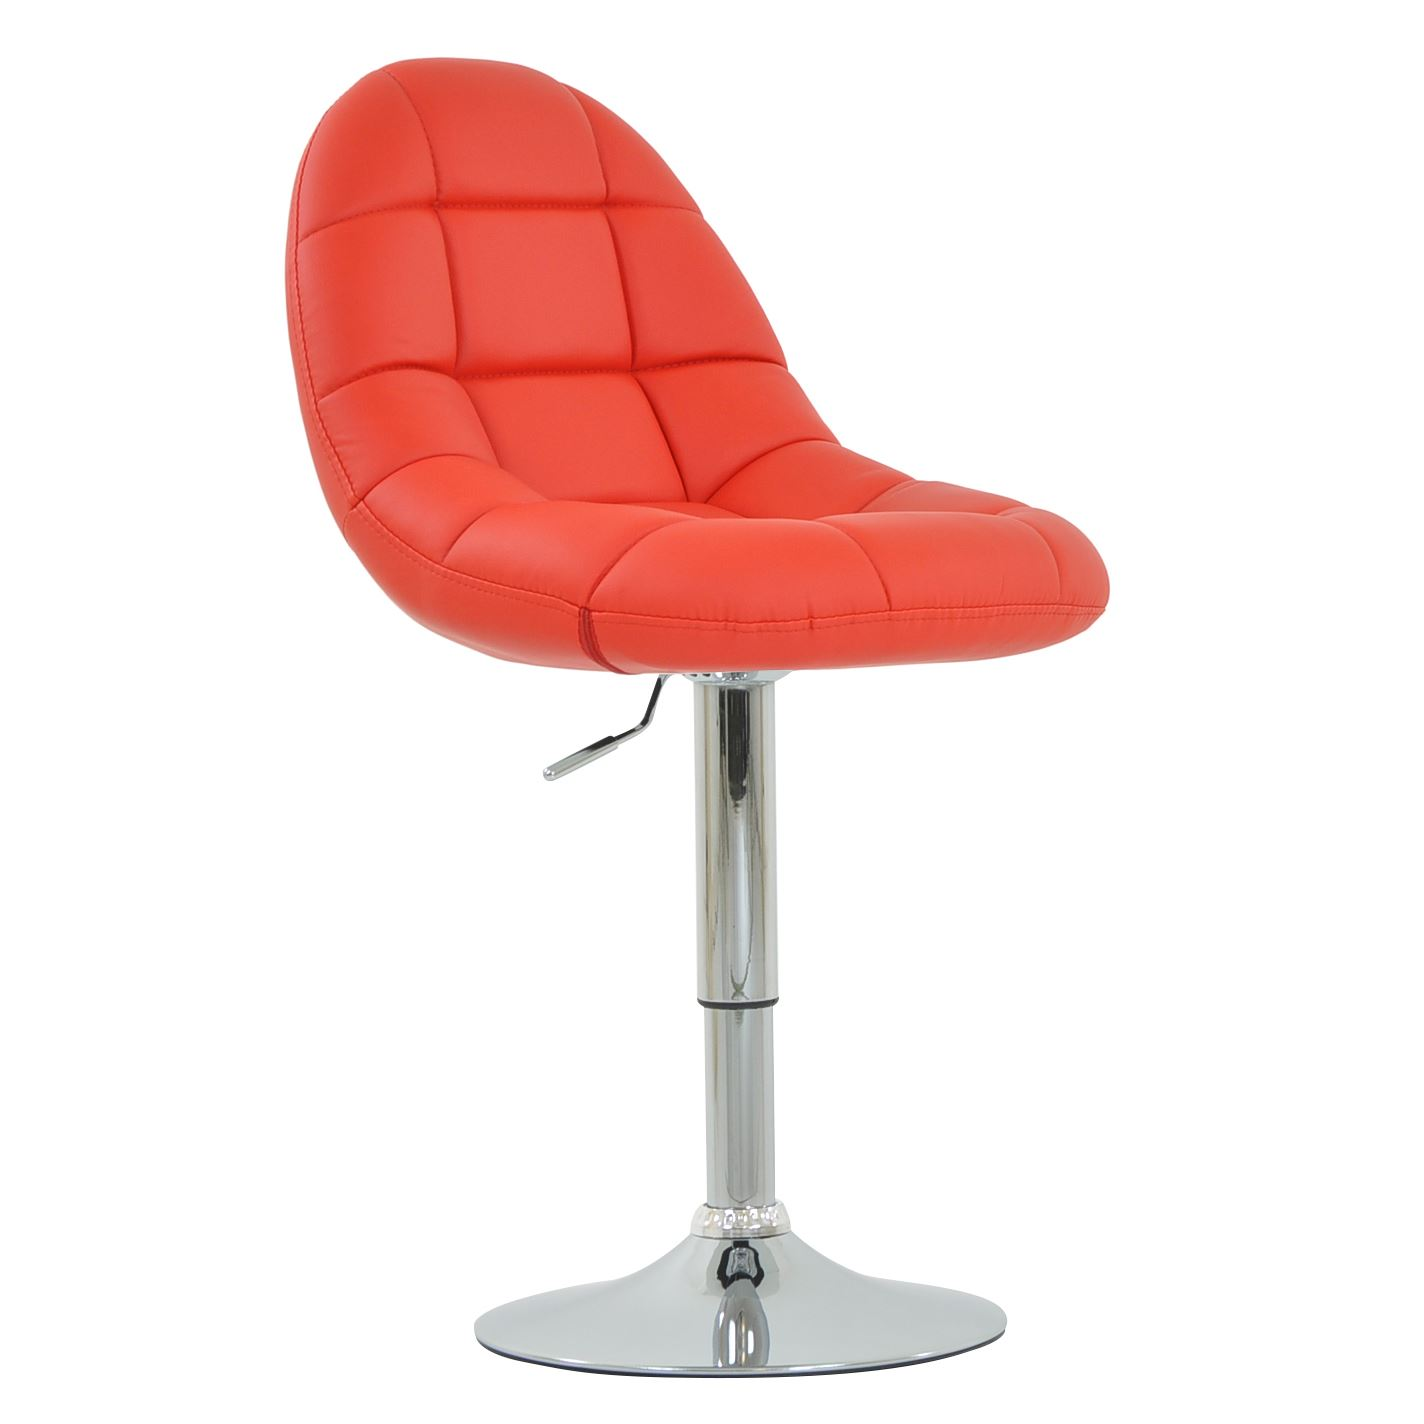 desk chair tesco doc mcstuffins australia montrose faux leather padded swivel office dining ebay